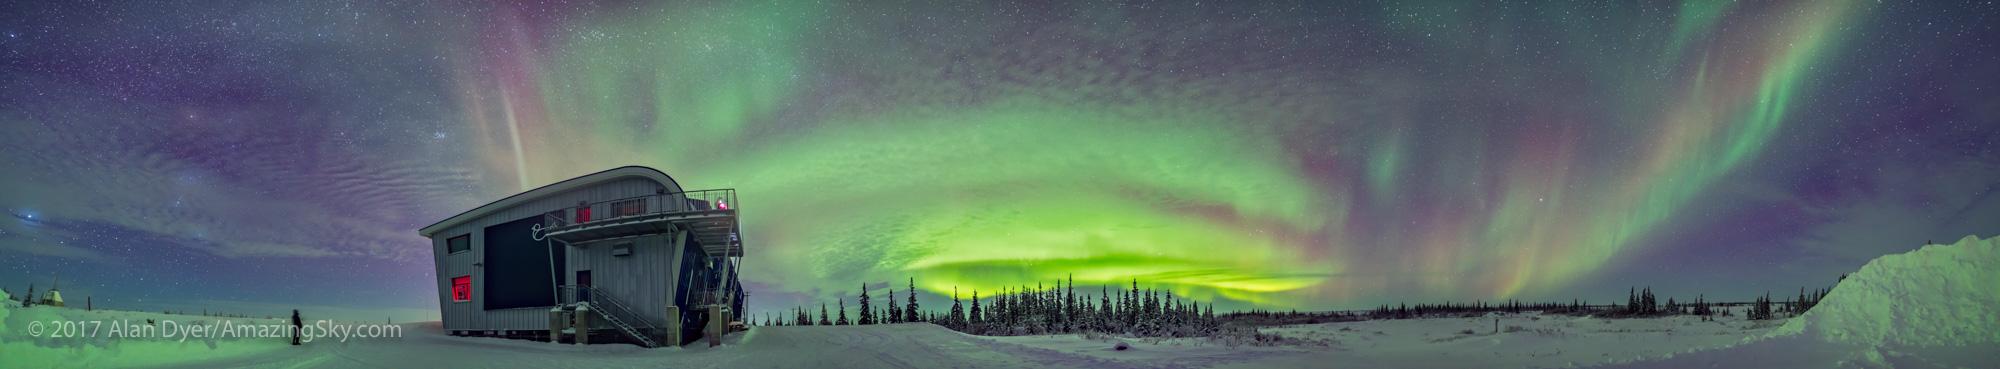 Aurora Panorama from Northern Studies Centre #3 (January 29, 201